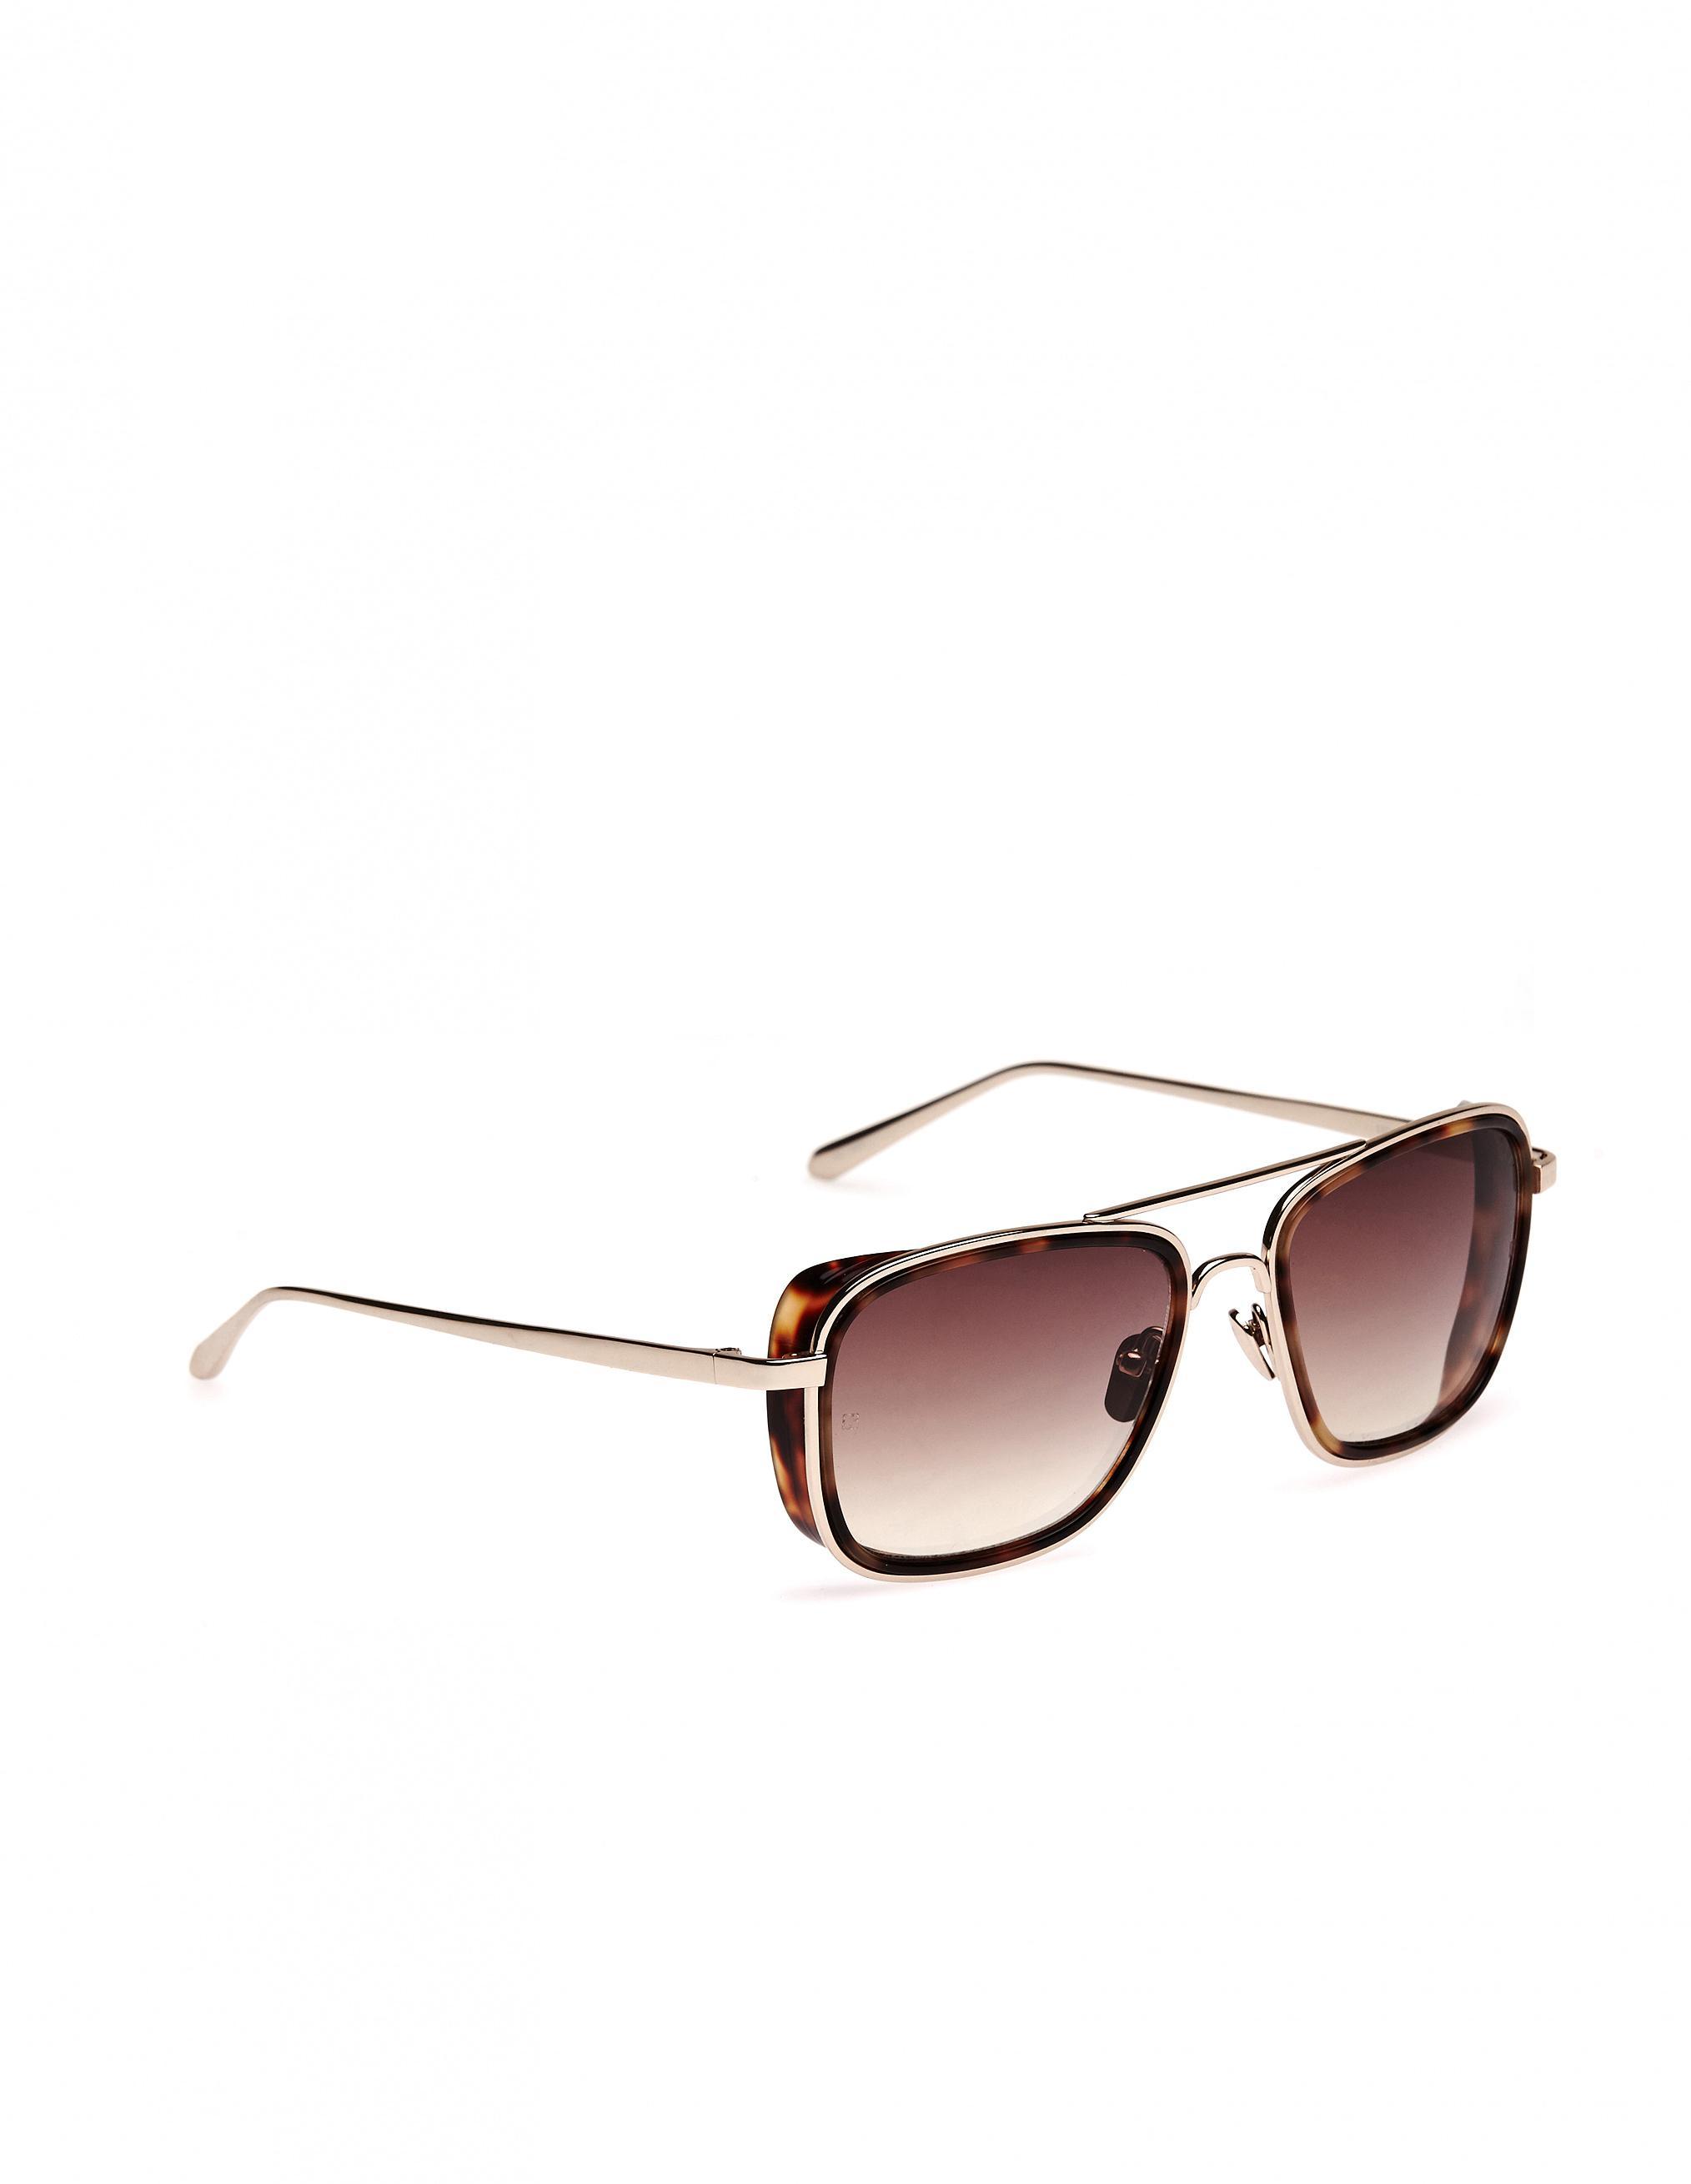 38ecaafe8d2 Linda Farrow Luxe Sunglasses in Brown - Lyst